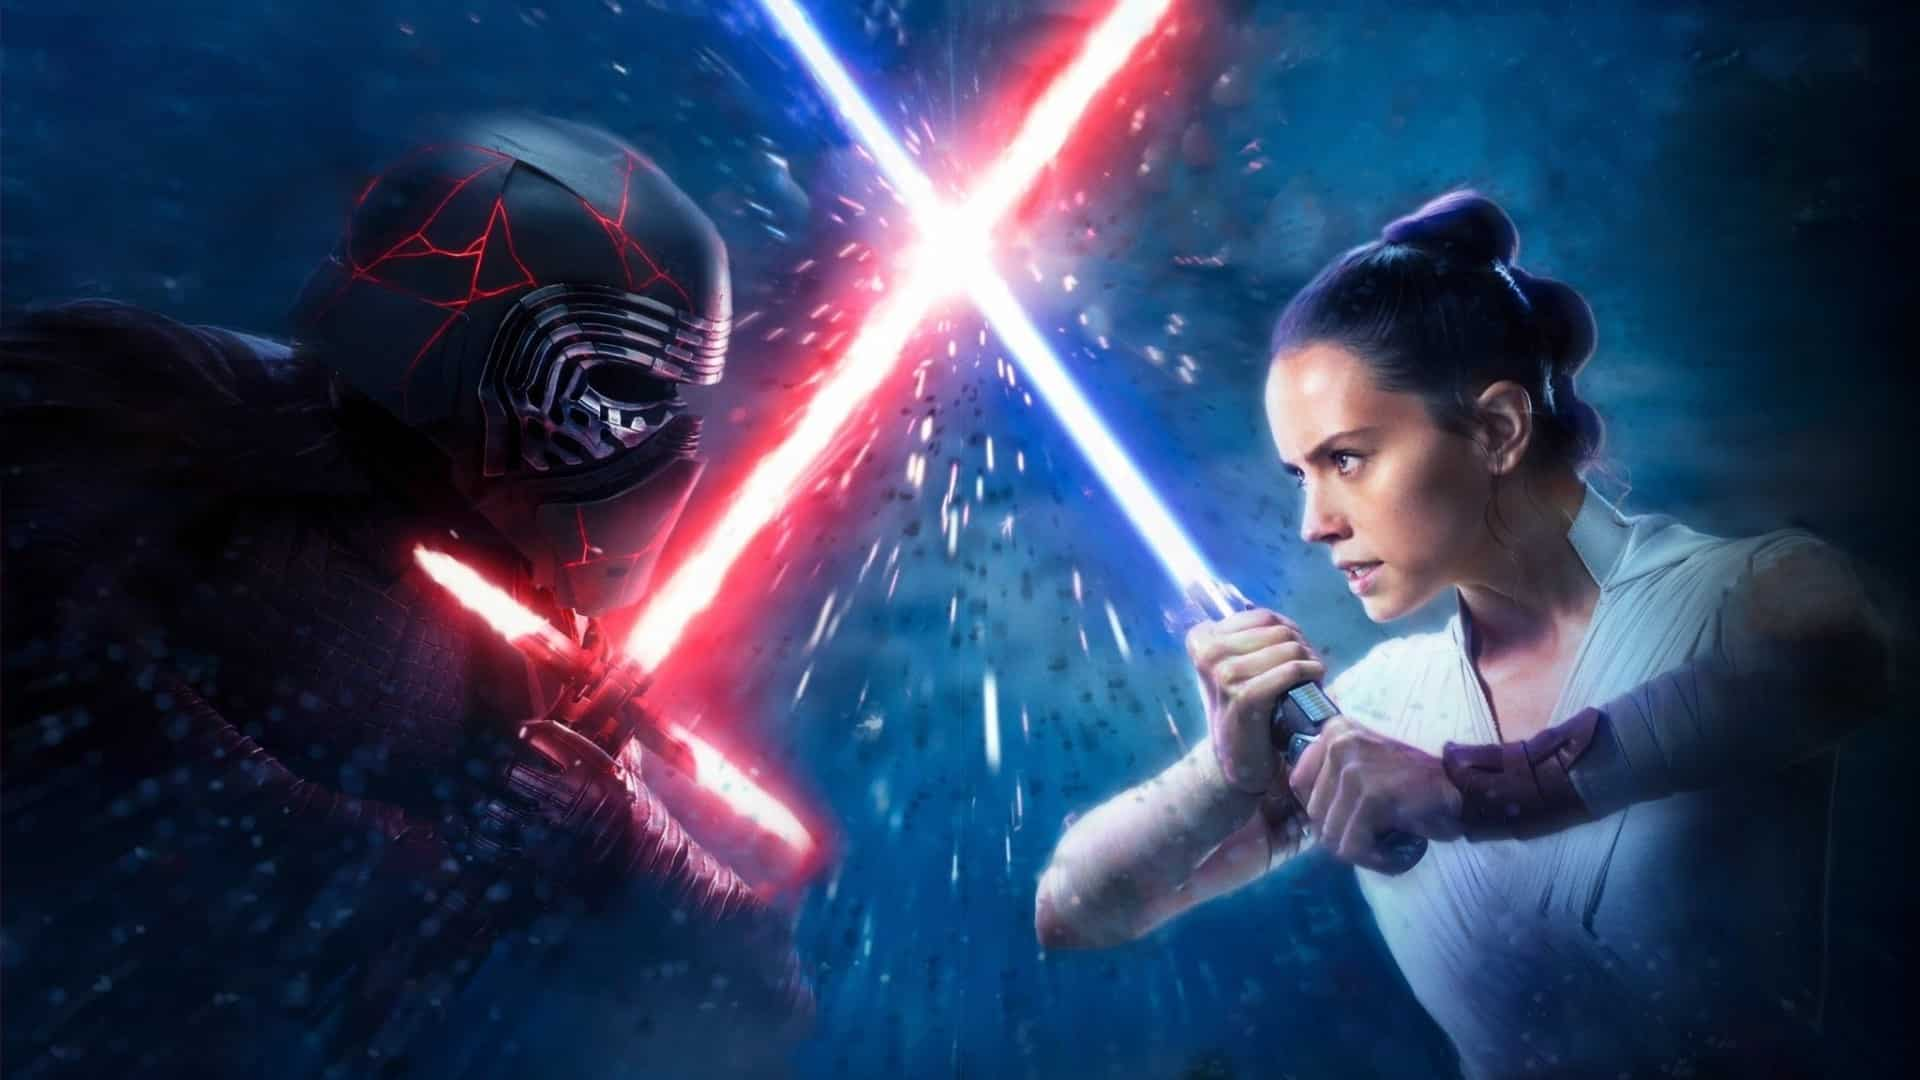 poradie star wars filmov